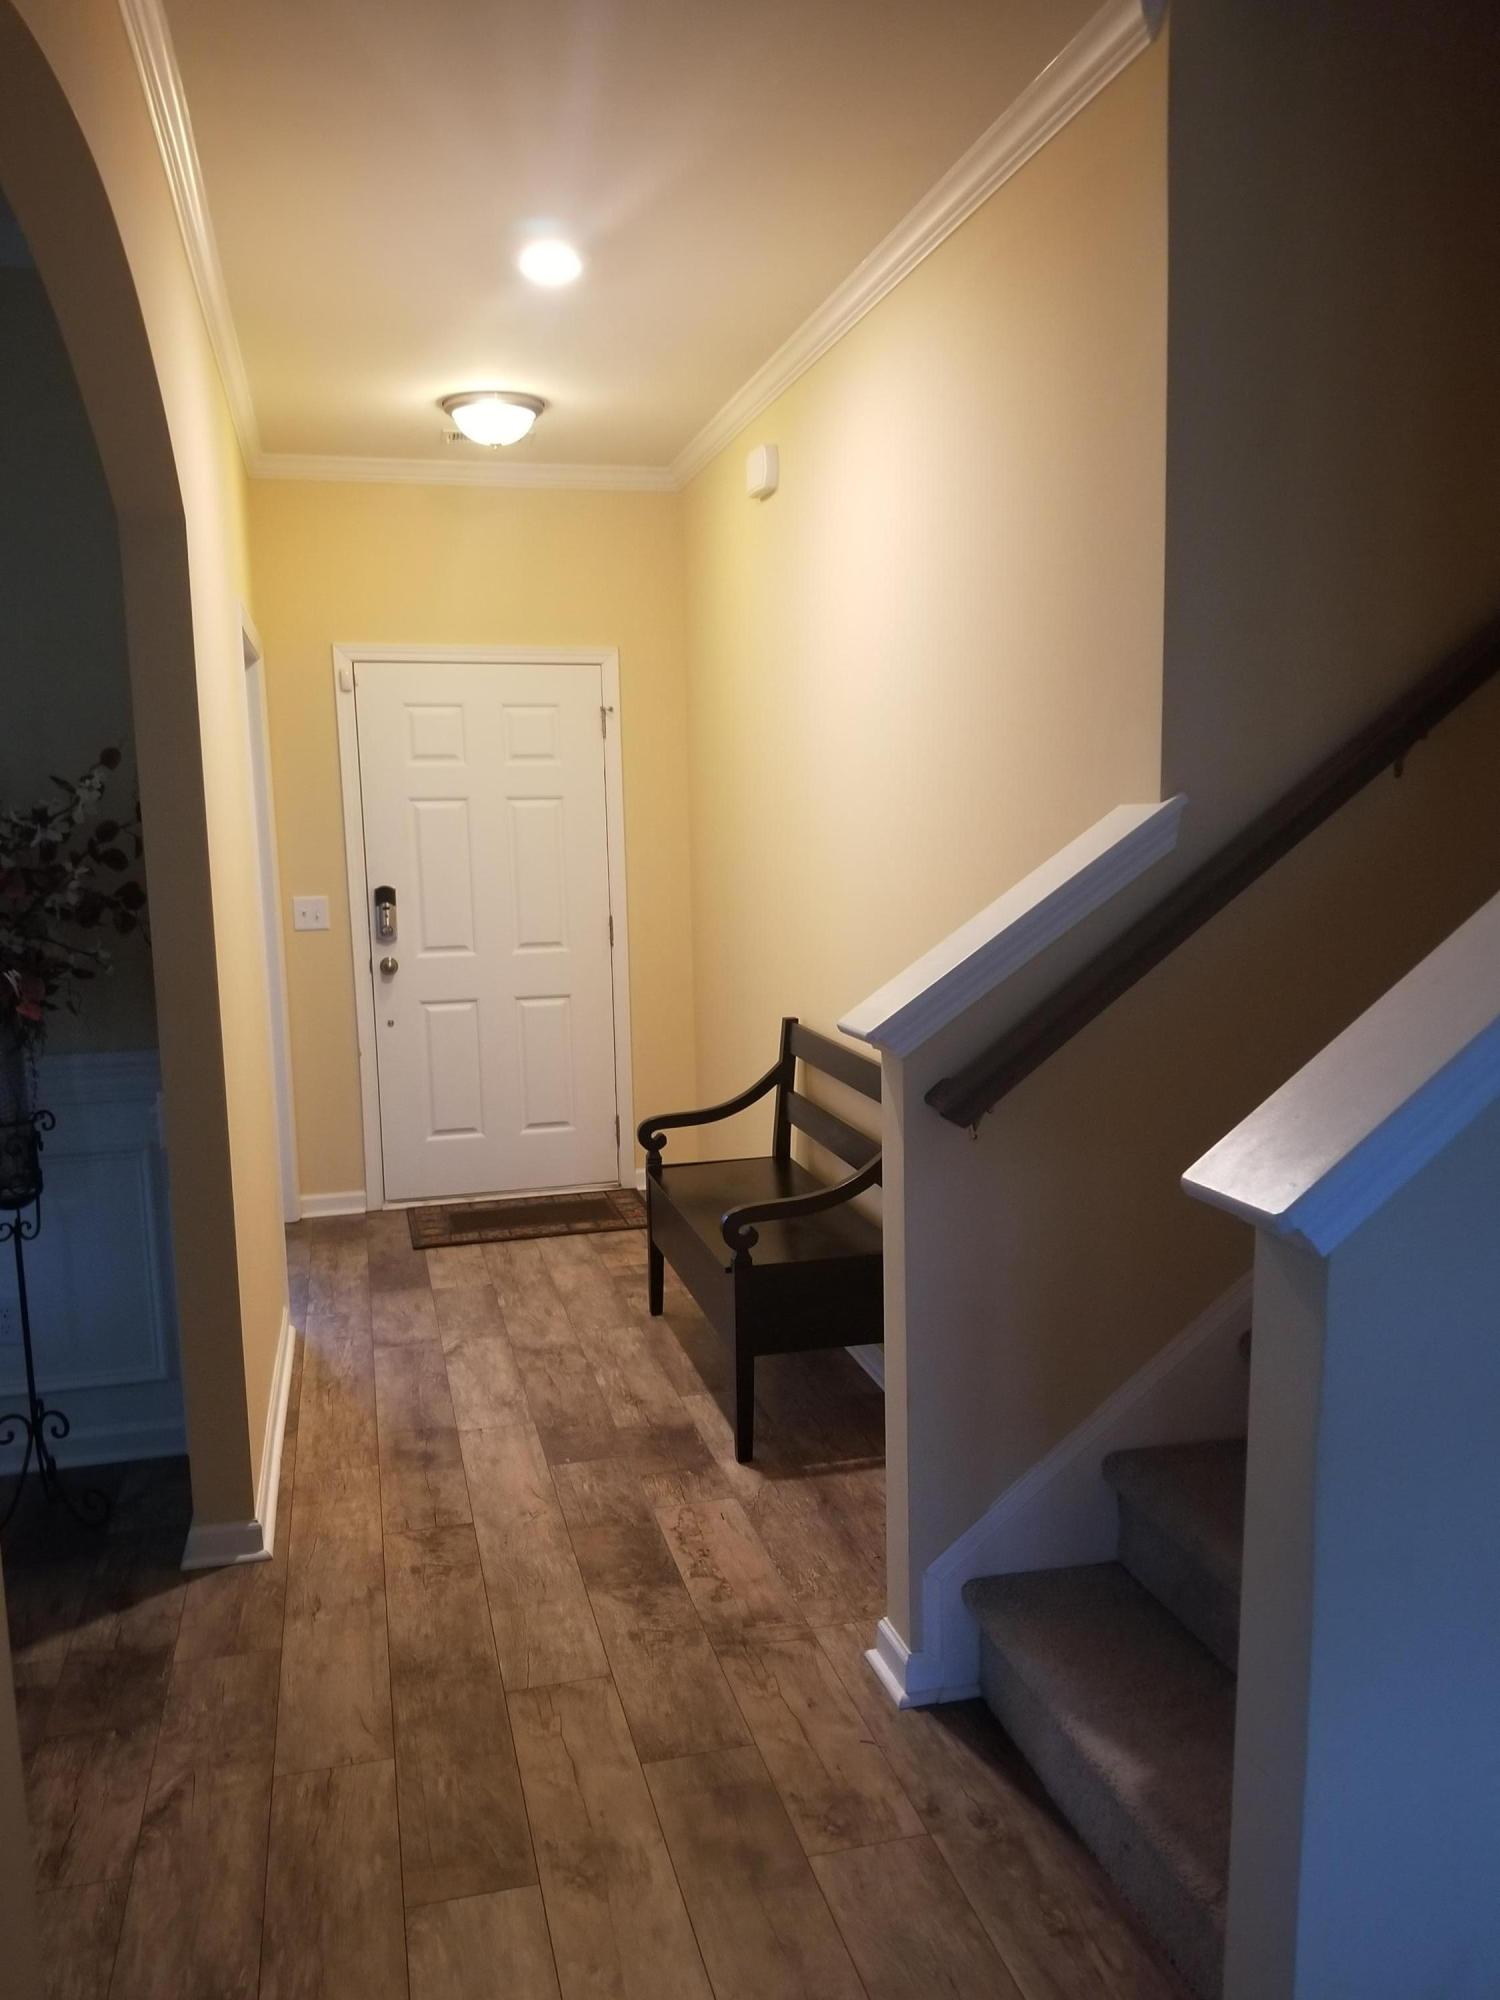 Moss Grove Plantation Homes For Sale - 163 Emerald Isle, Moncks Corner, SC - 0